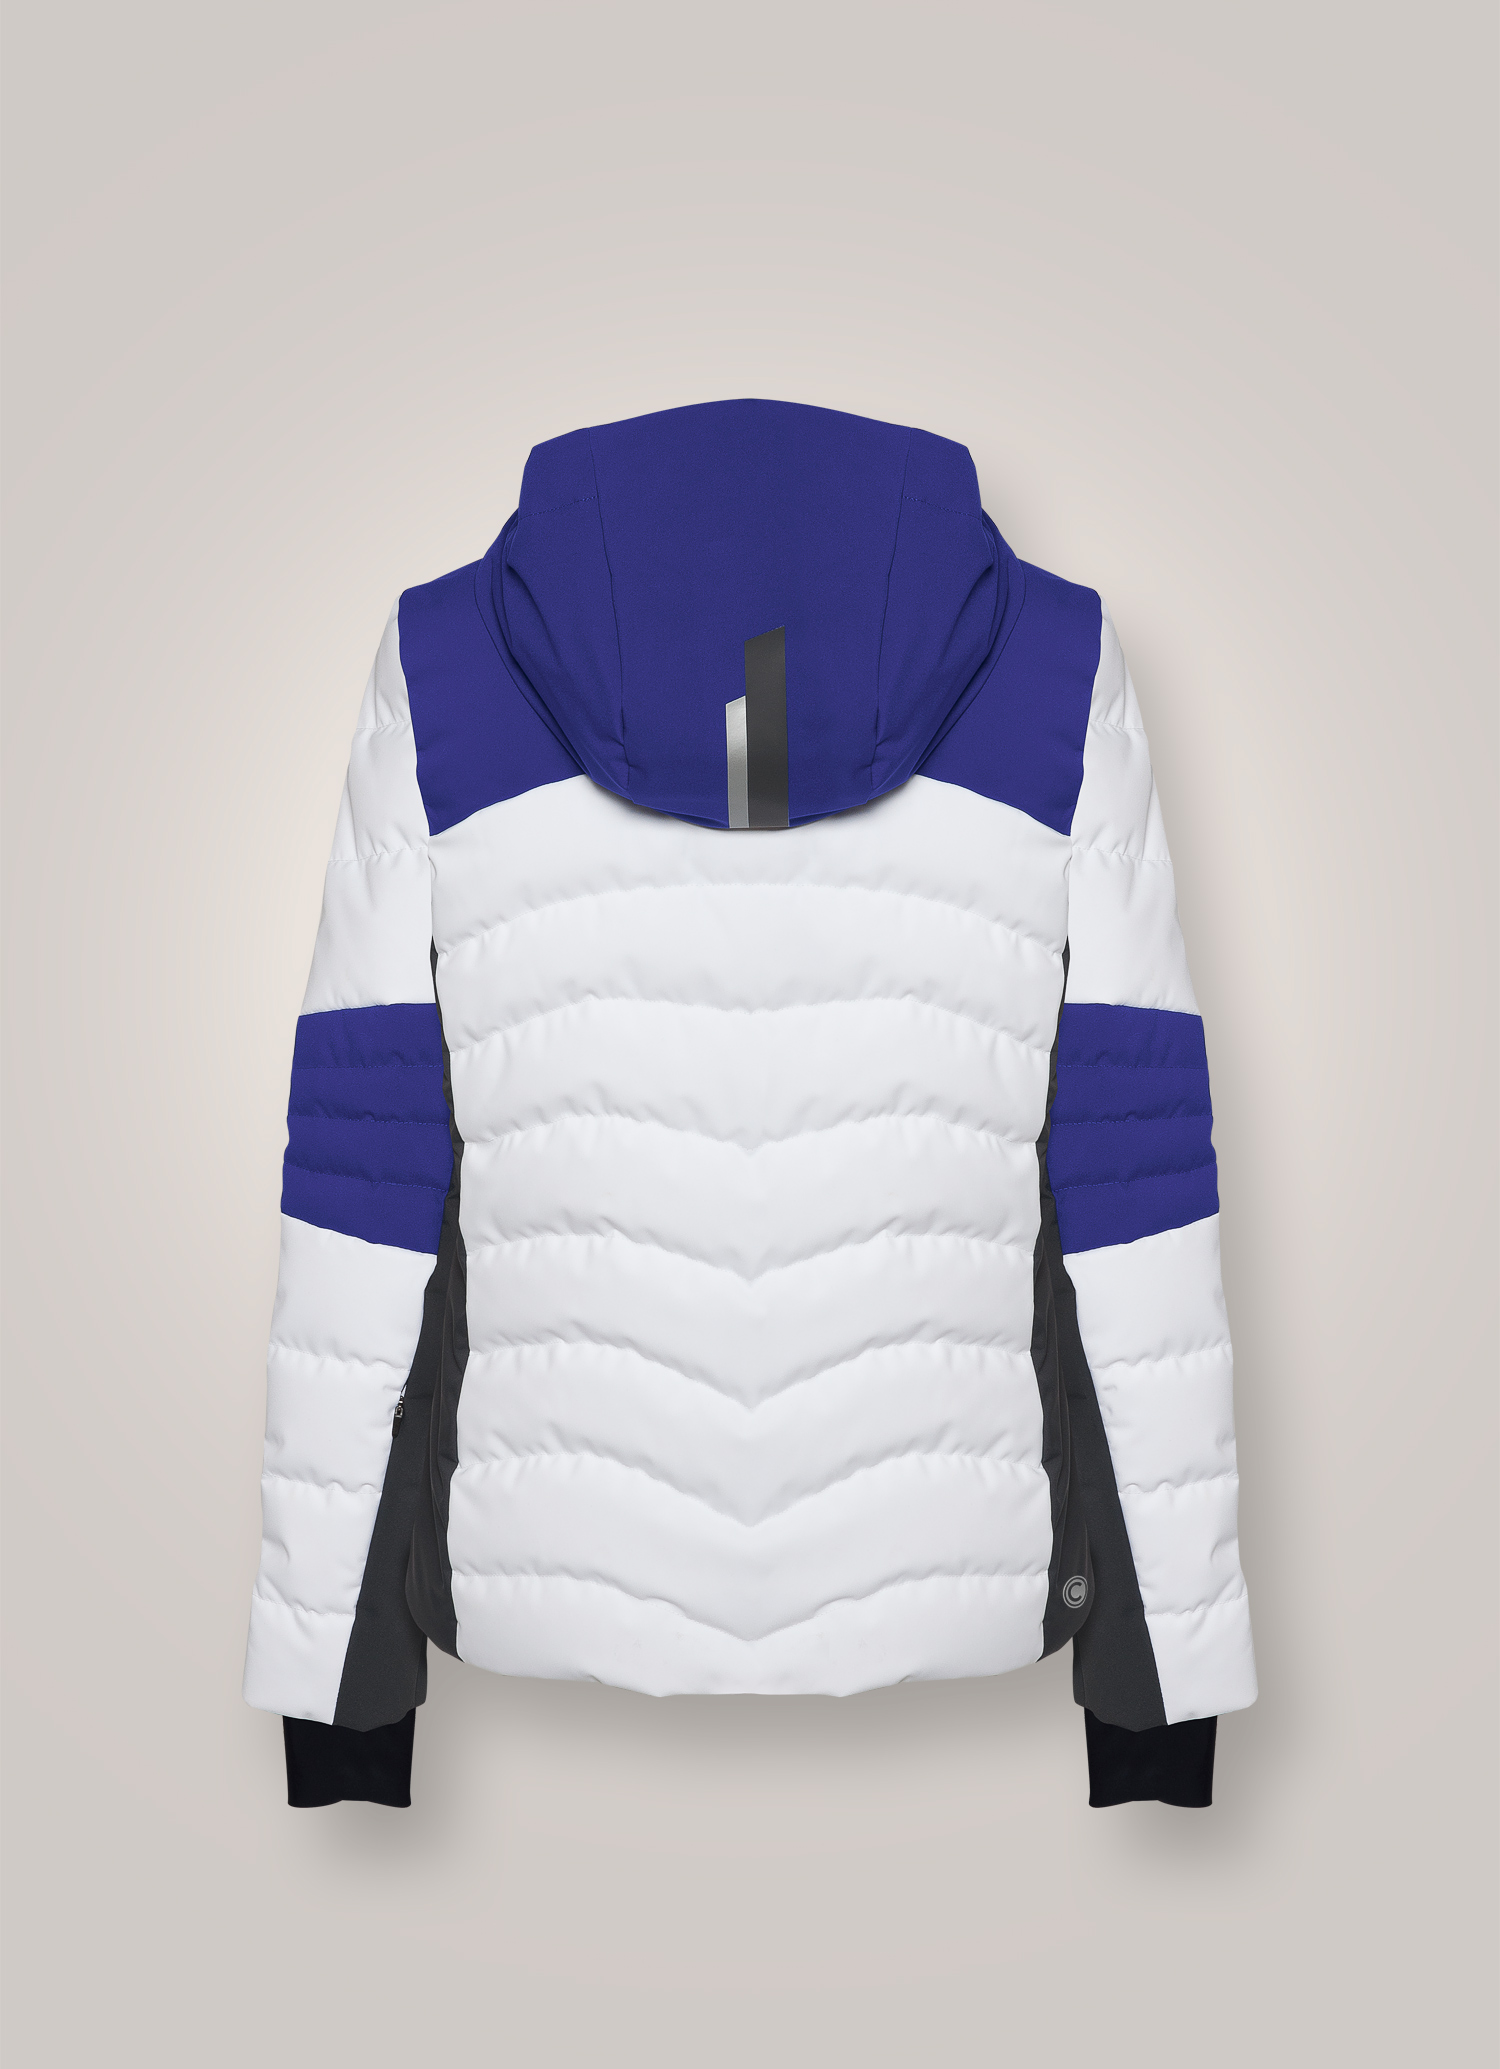 Colmar COURCHEVEL 1850 women s ski jacket with 15 f97aad3e1